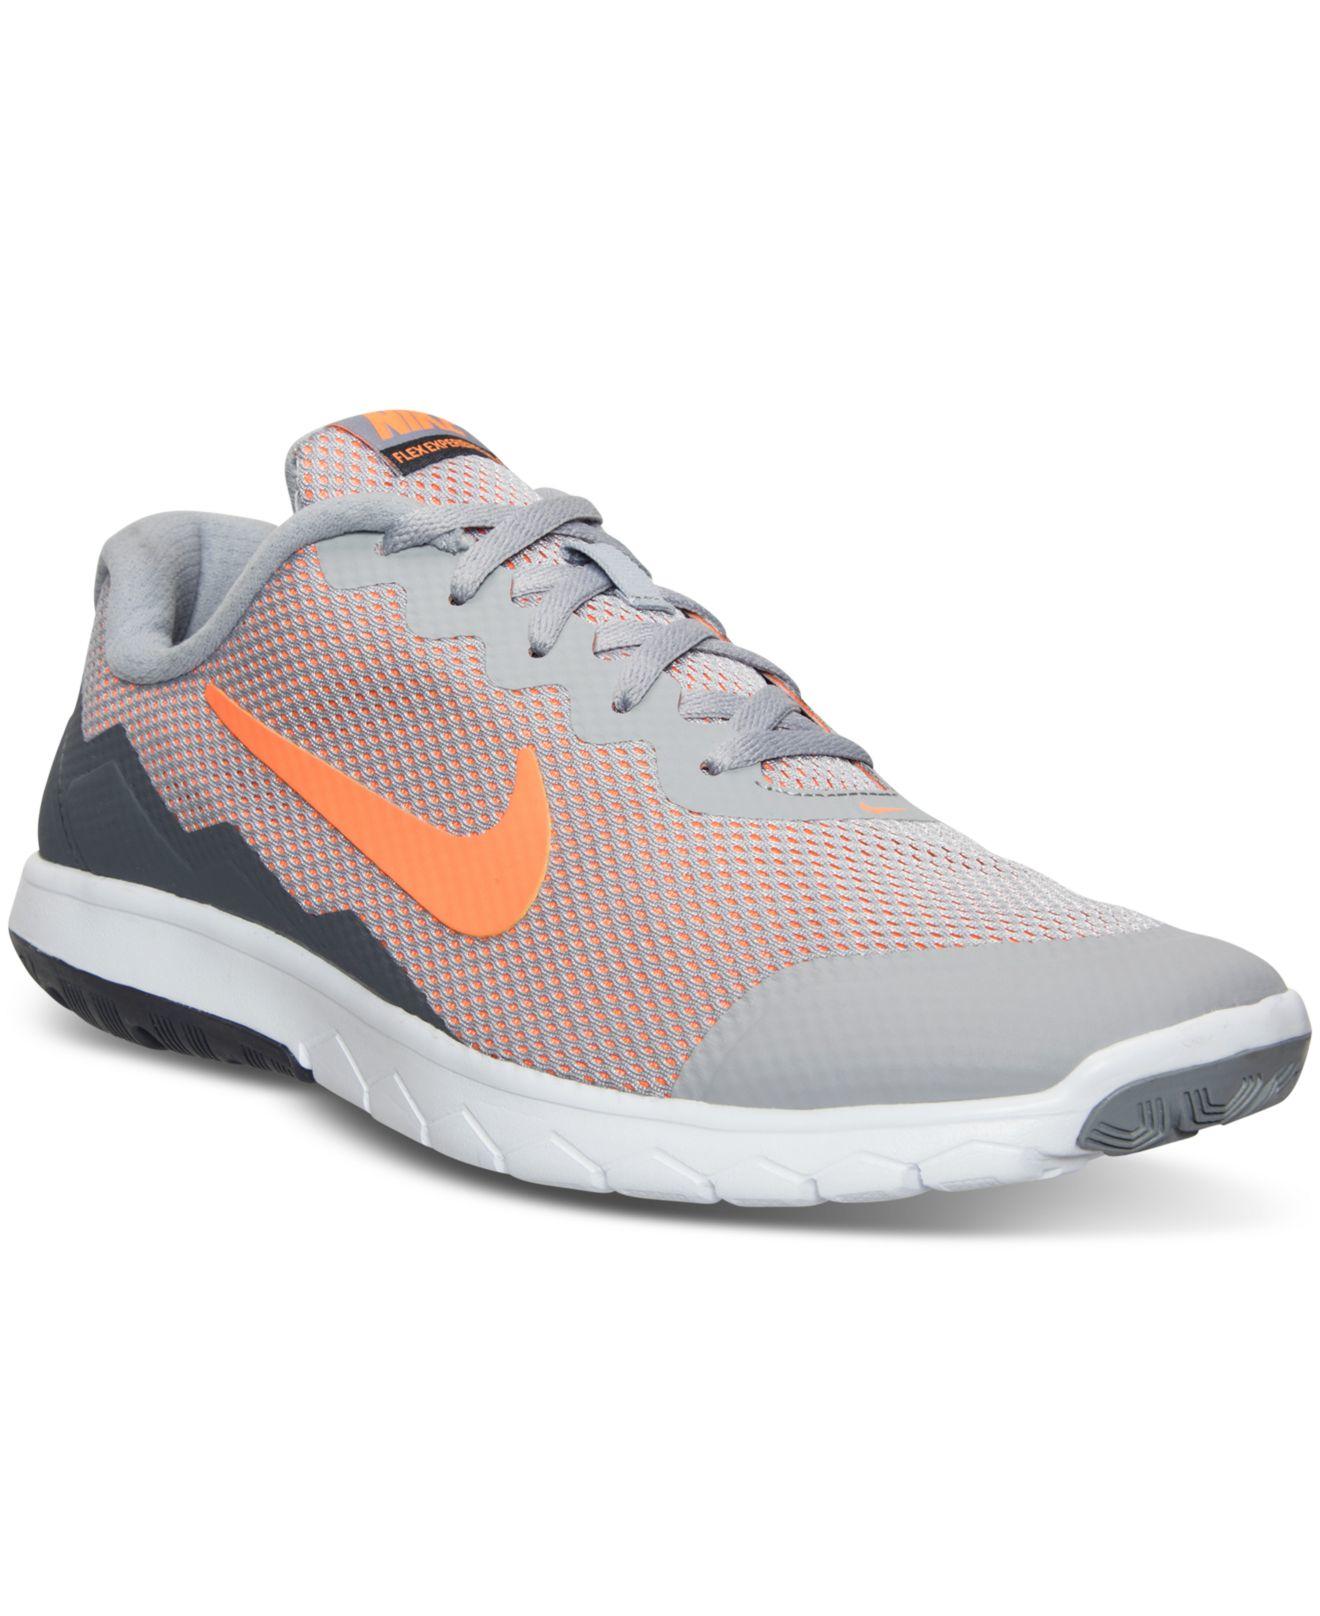 Lyst - Nike Men's Flex Experience Run 4 Wide Width Running ...